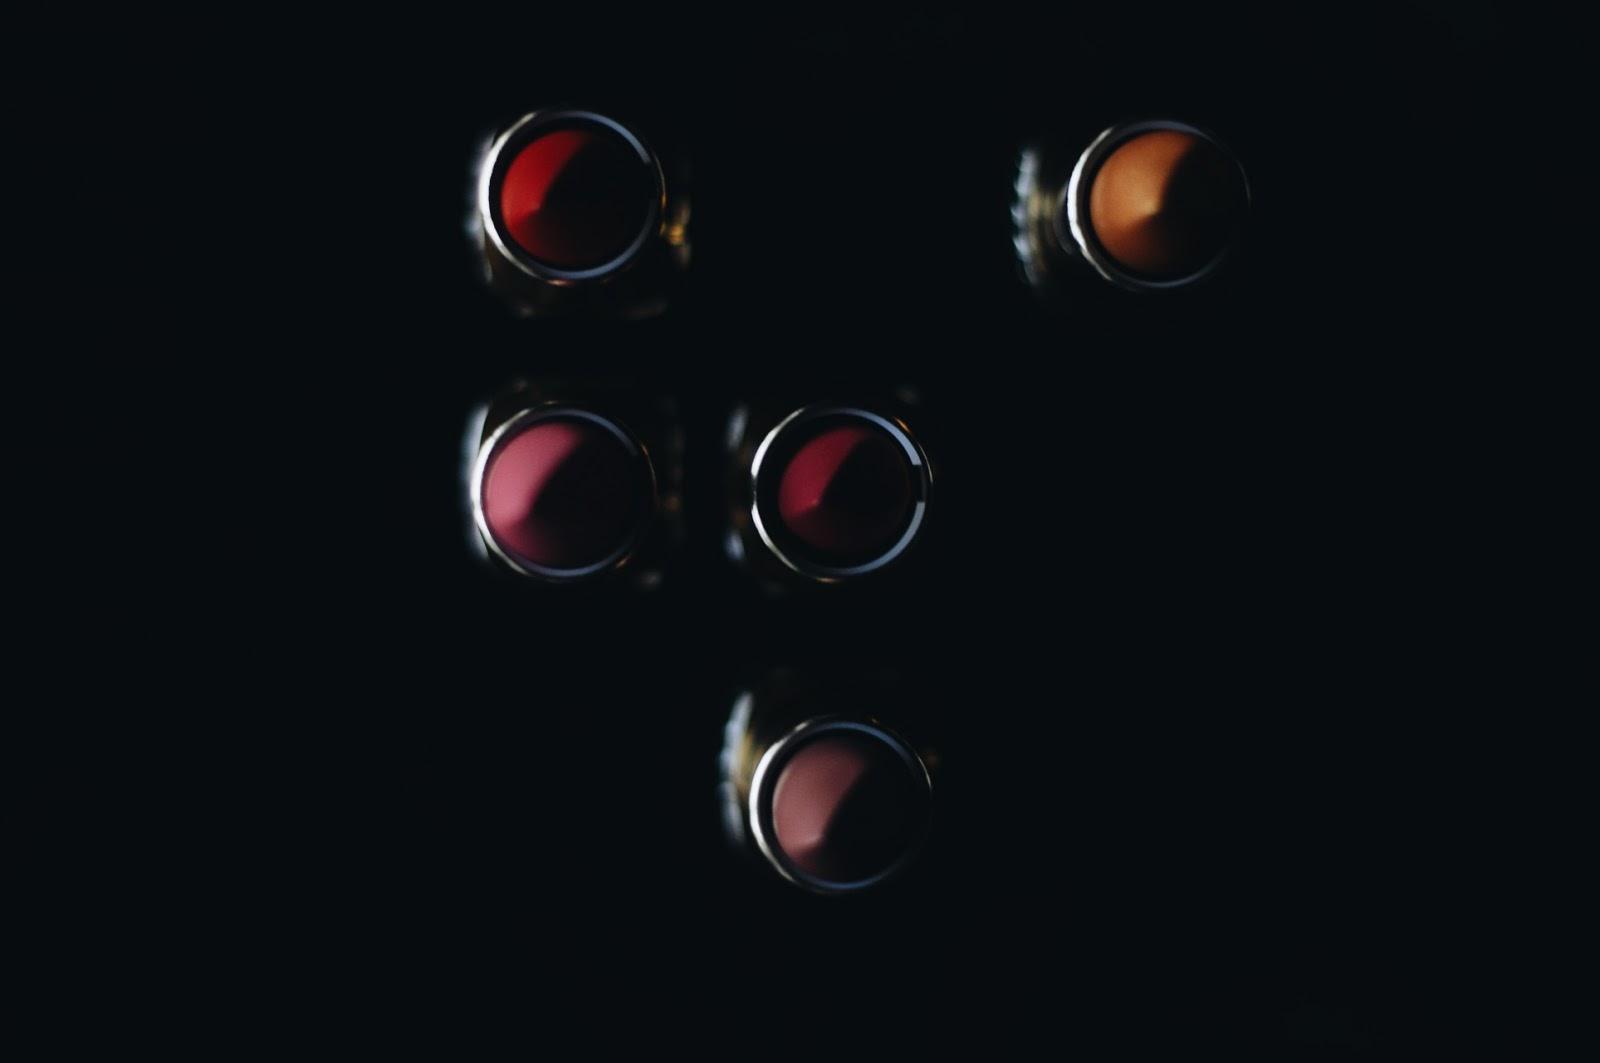 L'Oréal Gold Obsession lipstick collection · L'Oréal Gold Obsession lūpukrāsu kolekcija